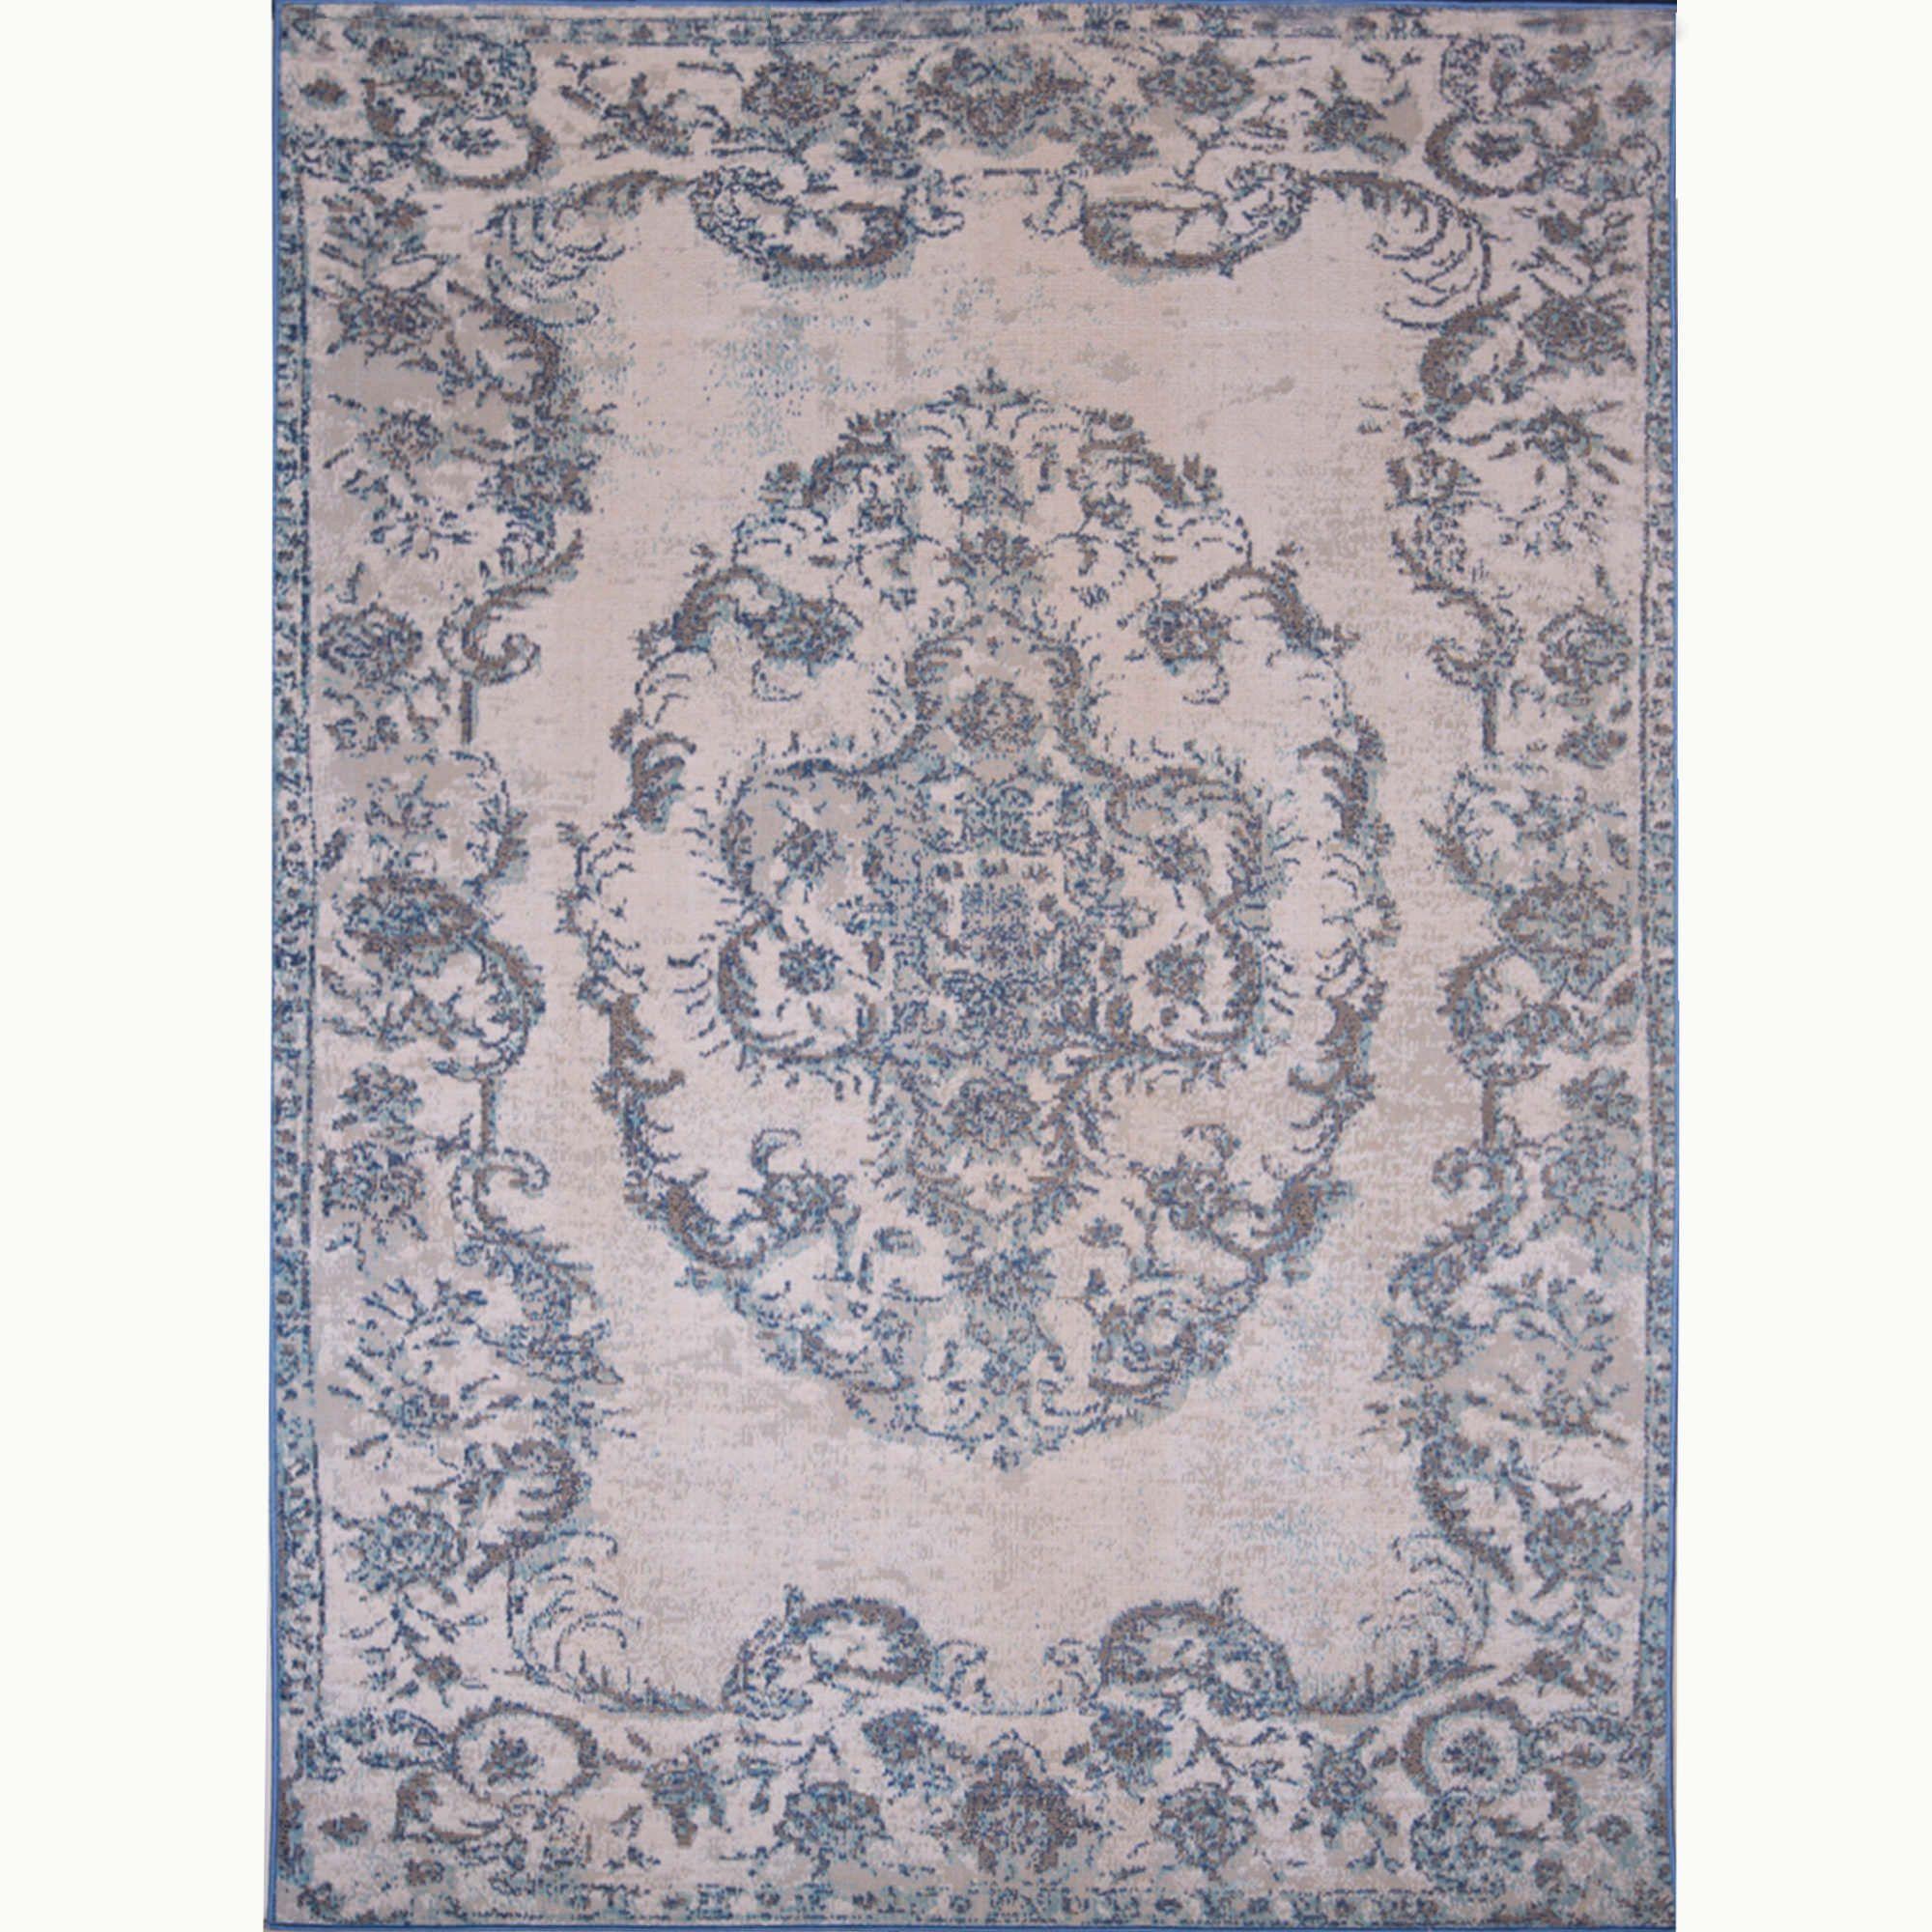 Somerset Blue-Ivory Traditional Indoor/Outdoor Area Rug